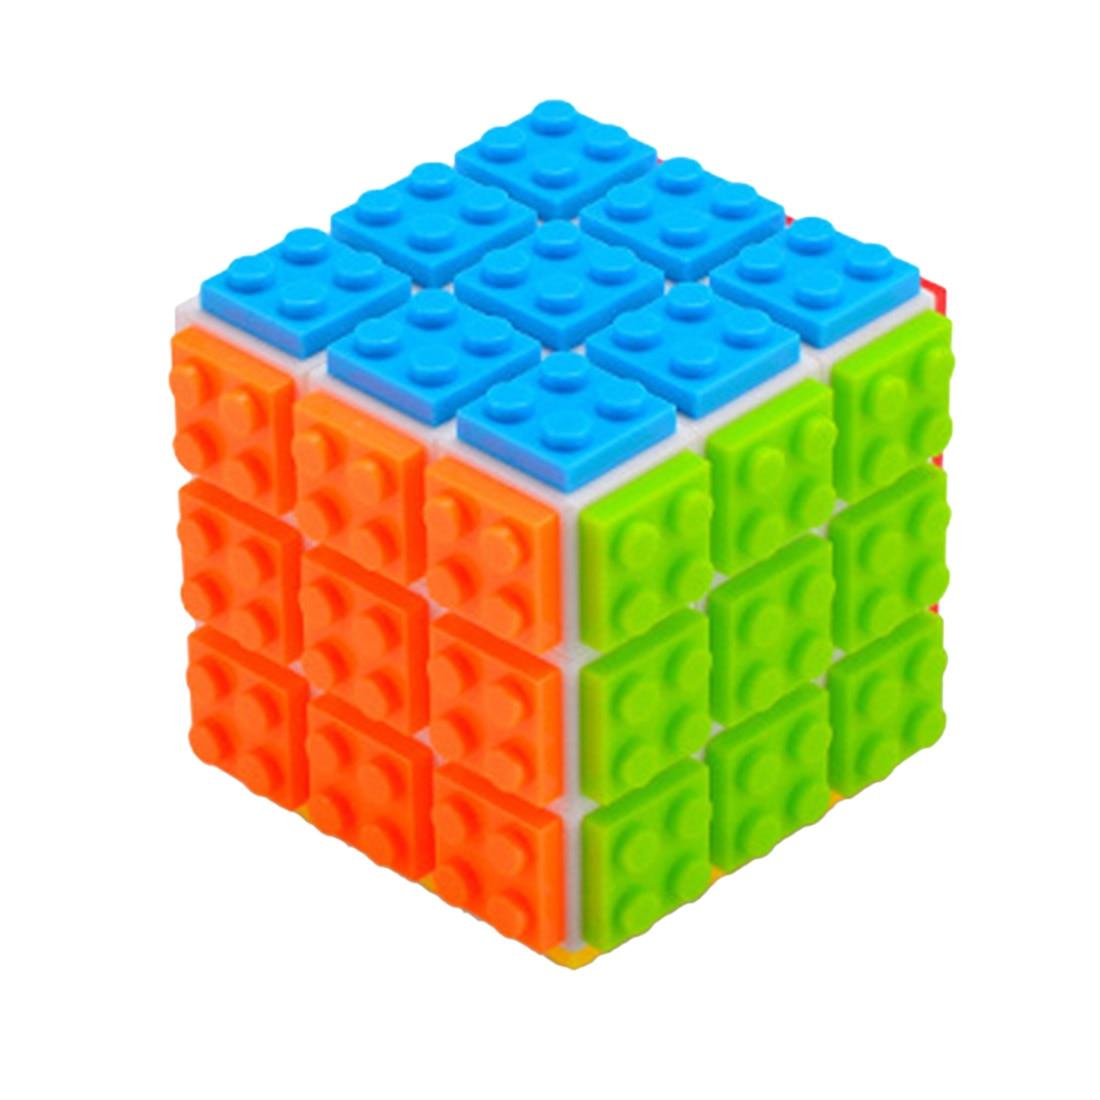 GAN460 M 4x4x4 IPG Magnetic System Magic Cube Top Speed Twist Stickerless Cube